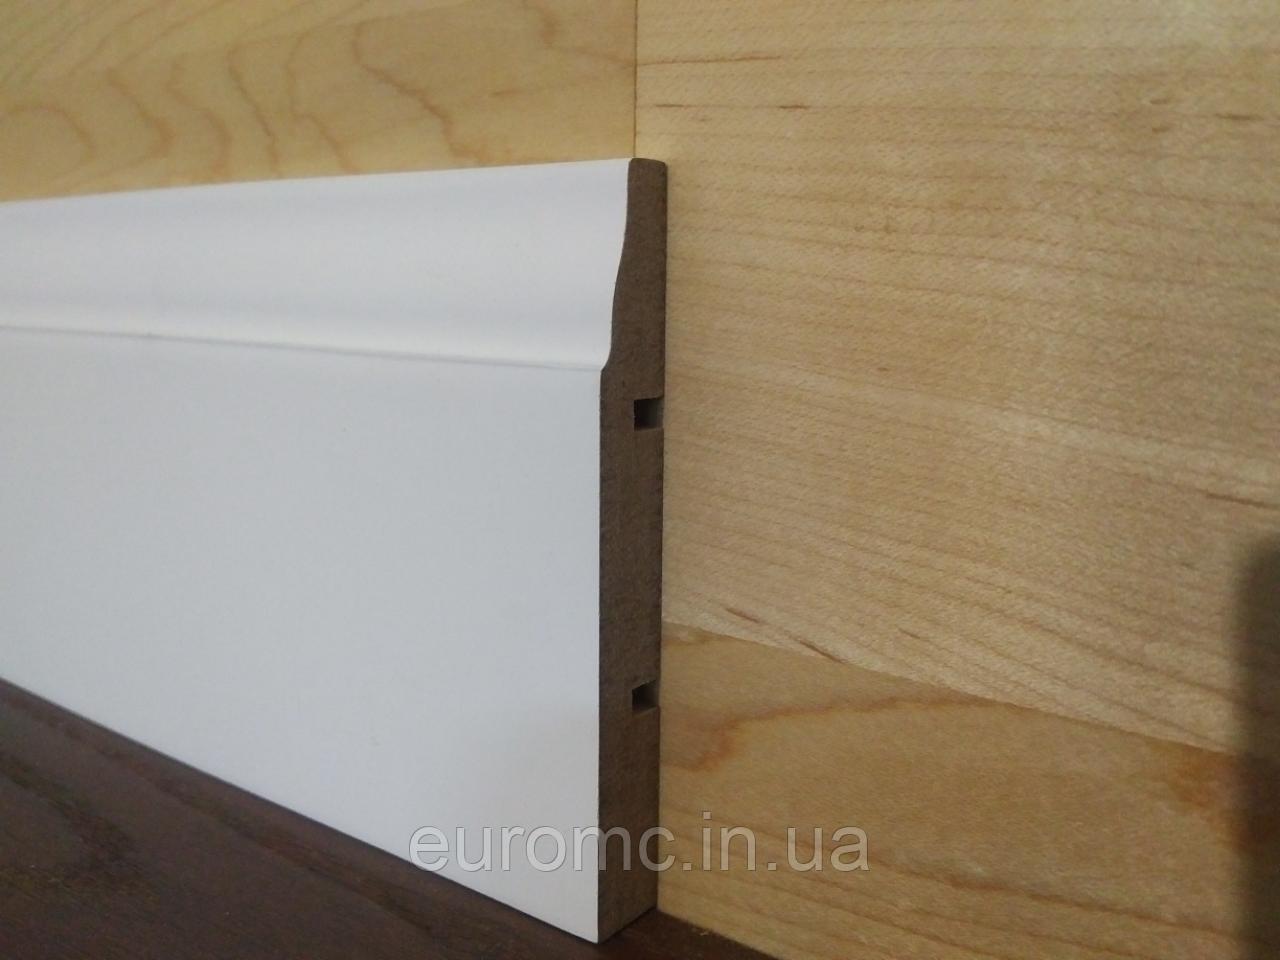 Плинтус МДФ 16х70мм крашенный эмаль